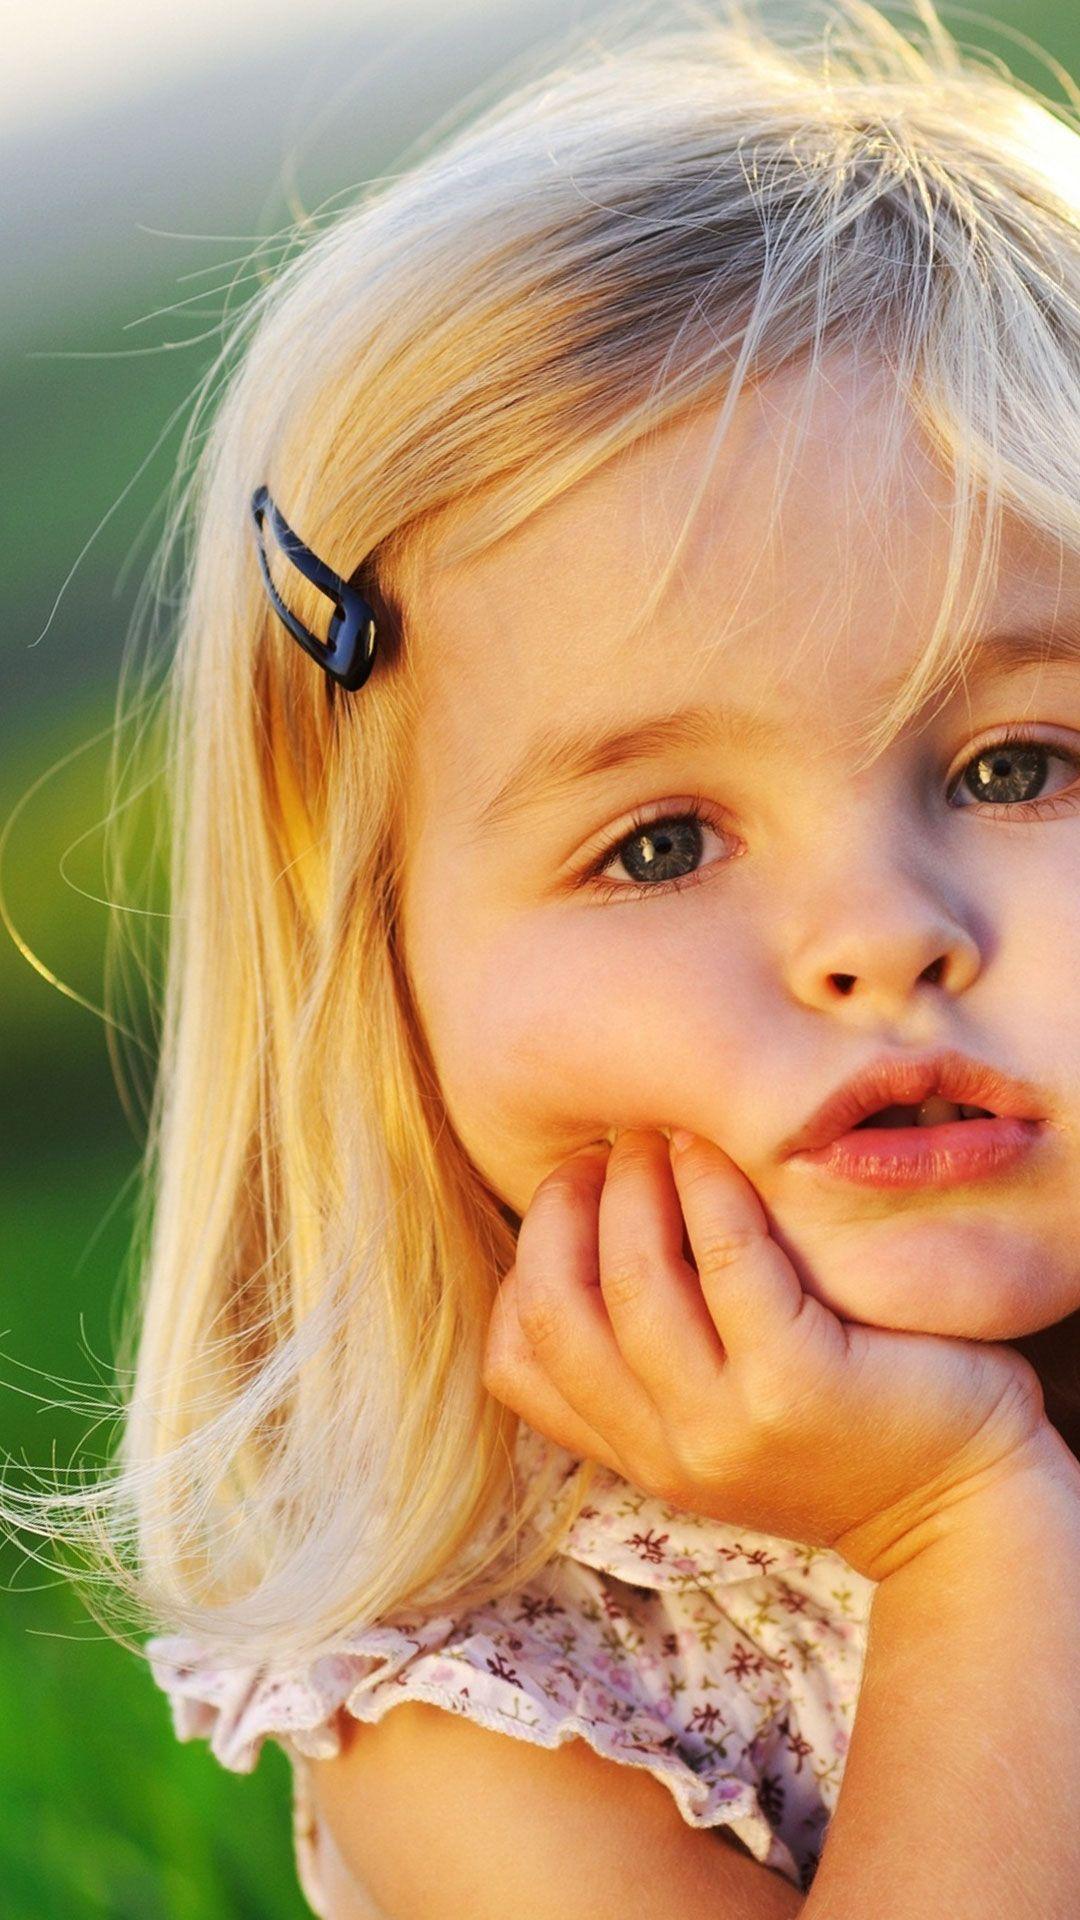 Cute Little Girl Wallpaper For Iphone 6 Plus Little Girl